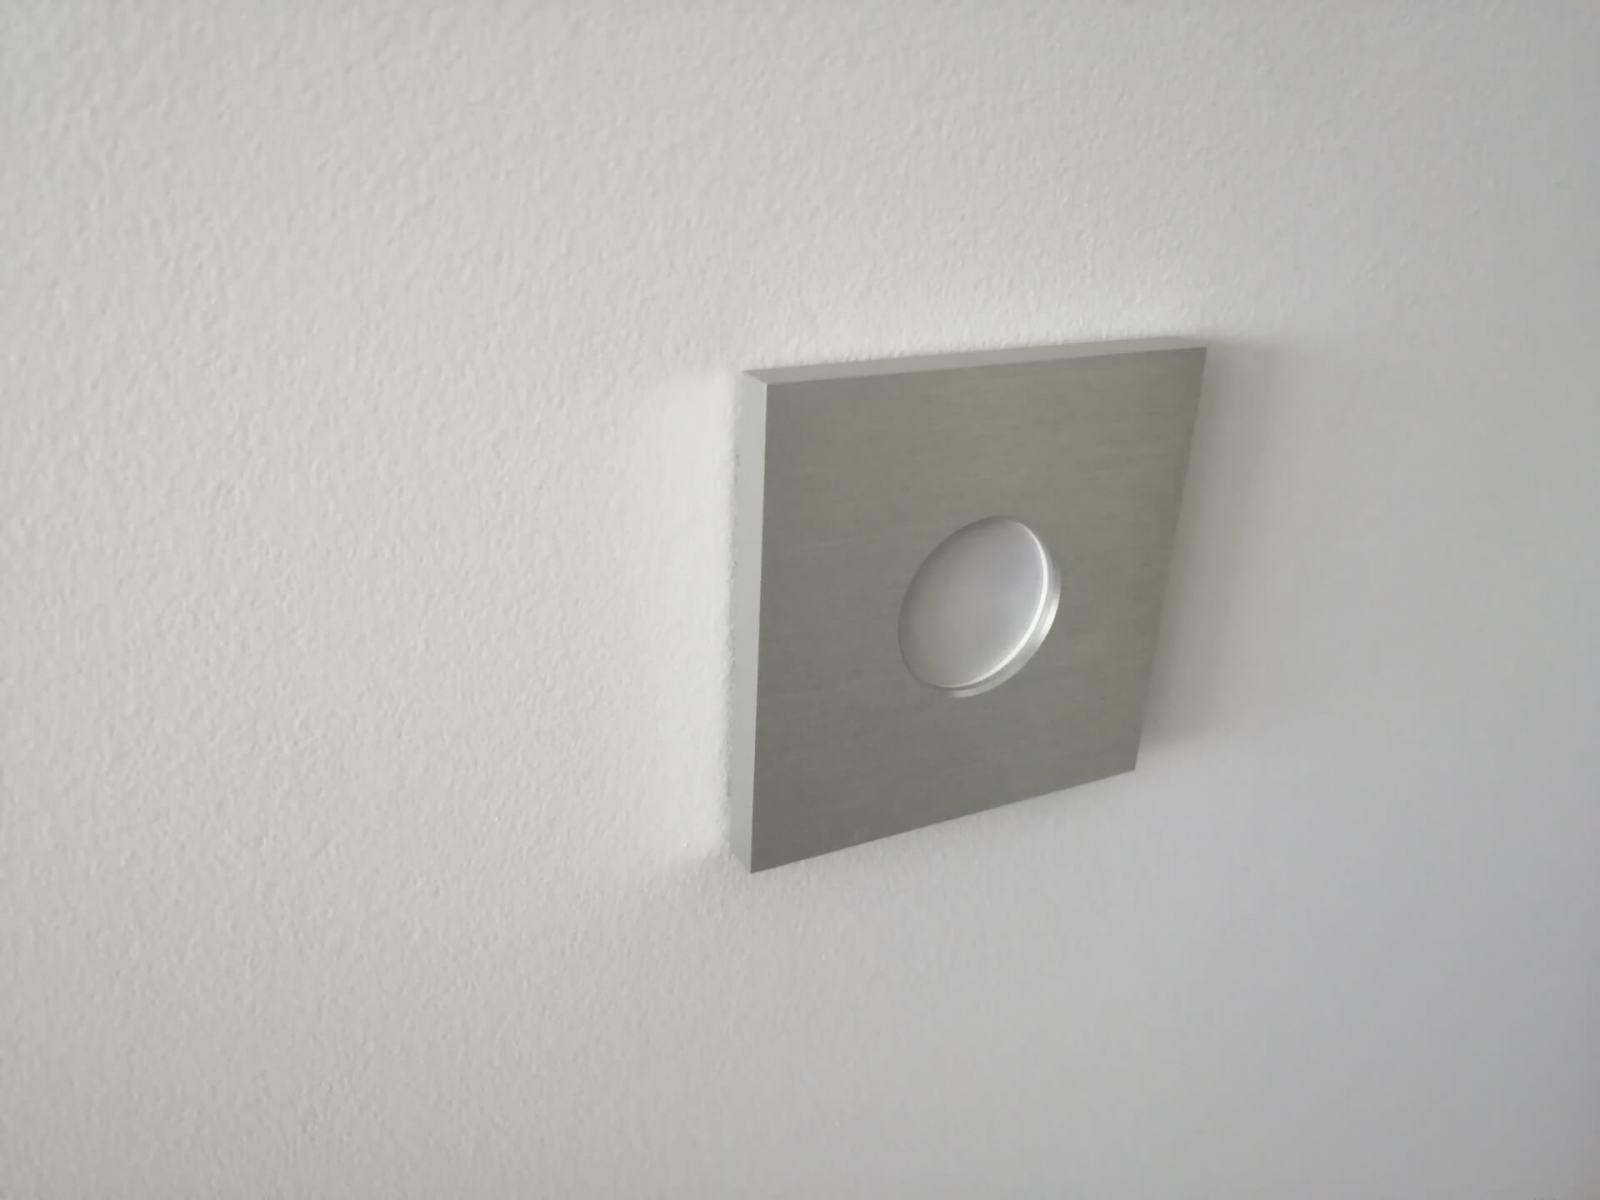 Appartement-Duplex-haute-gamme-Luxembourg-6